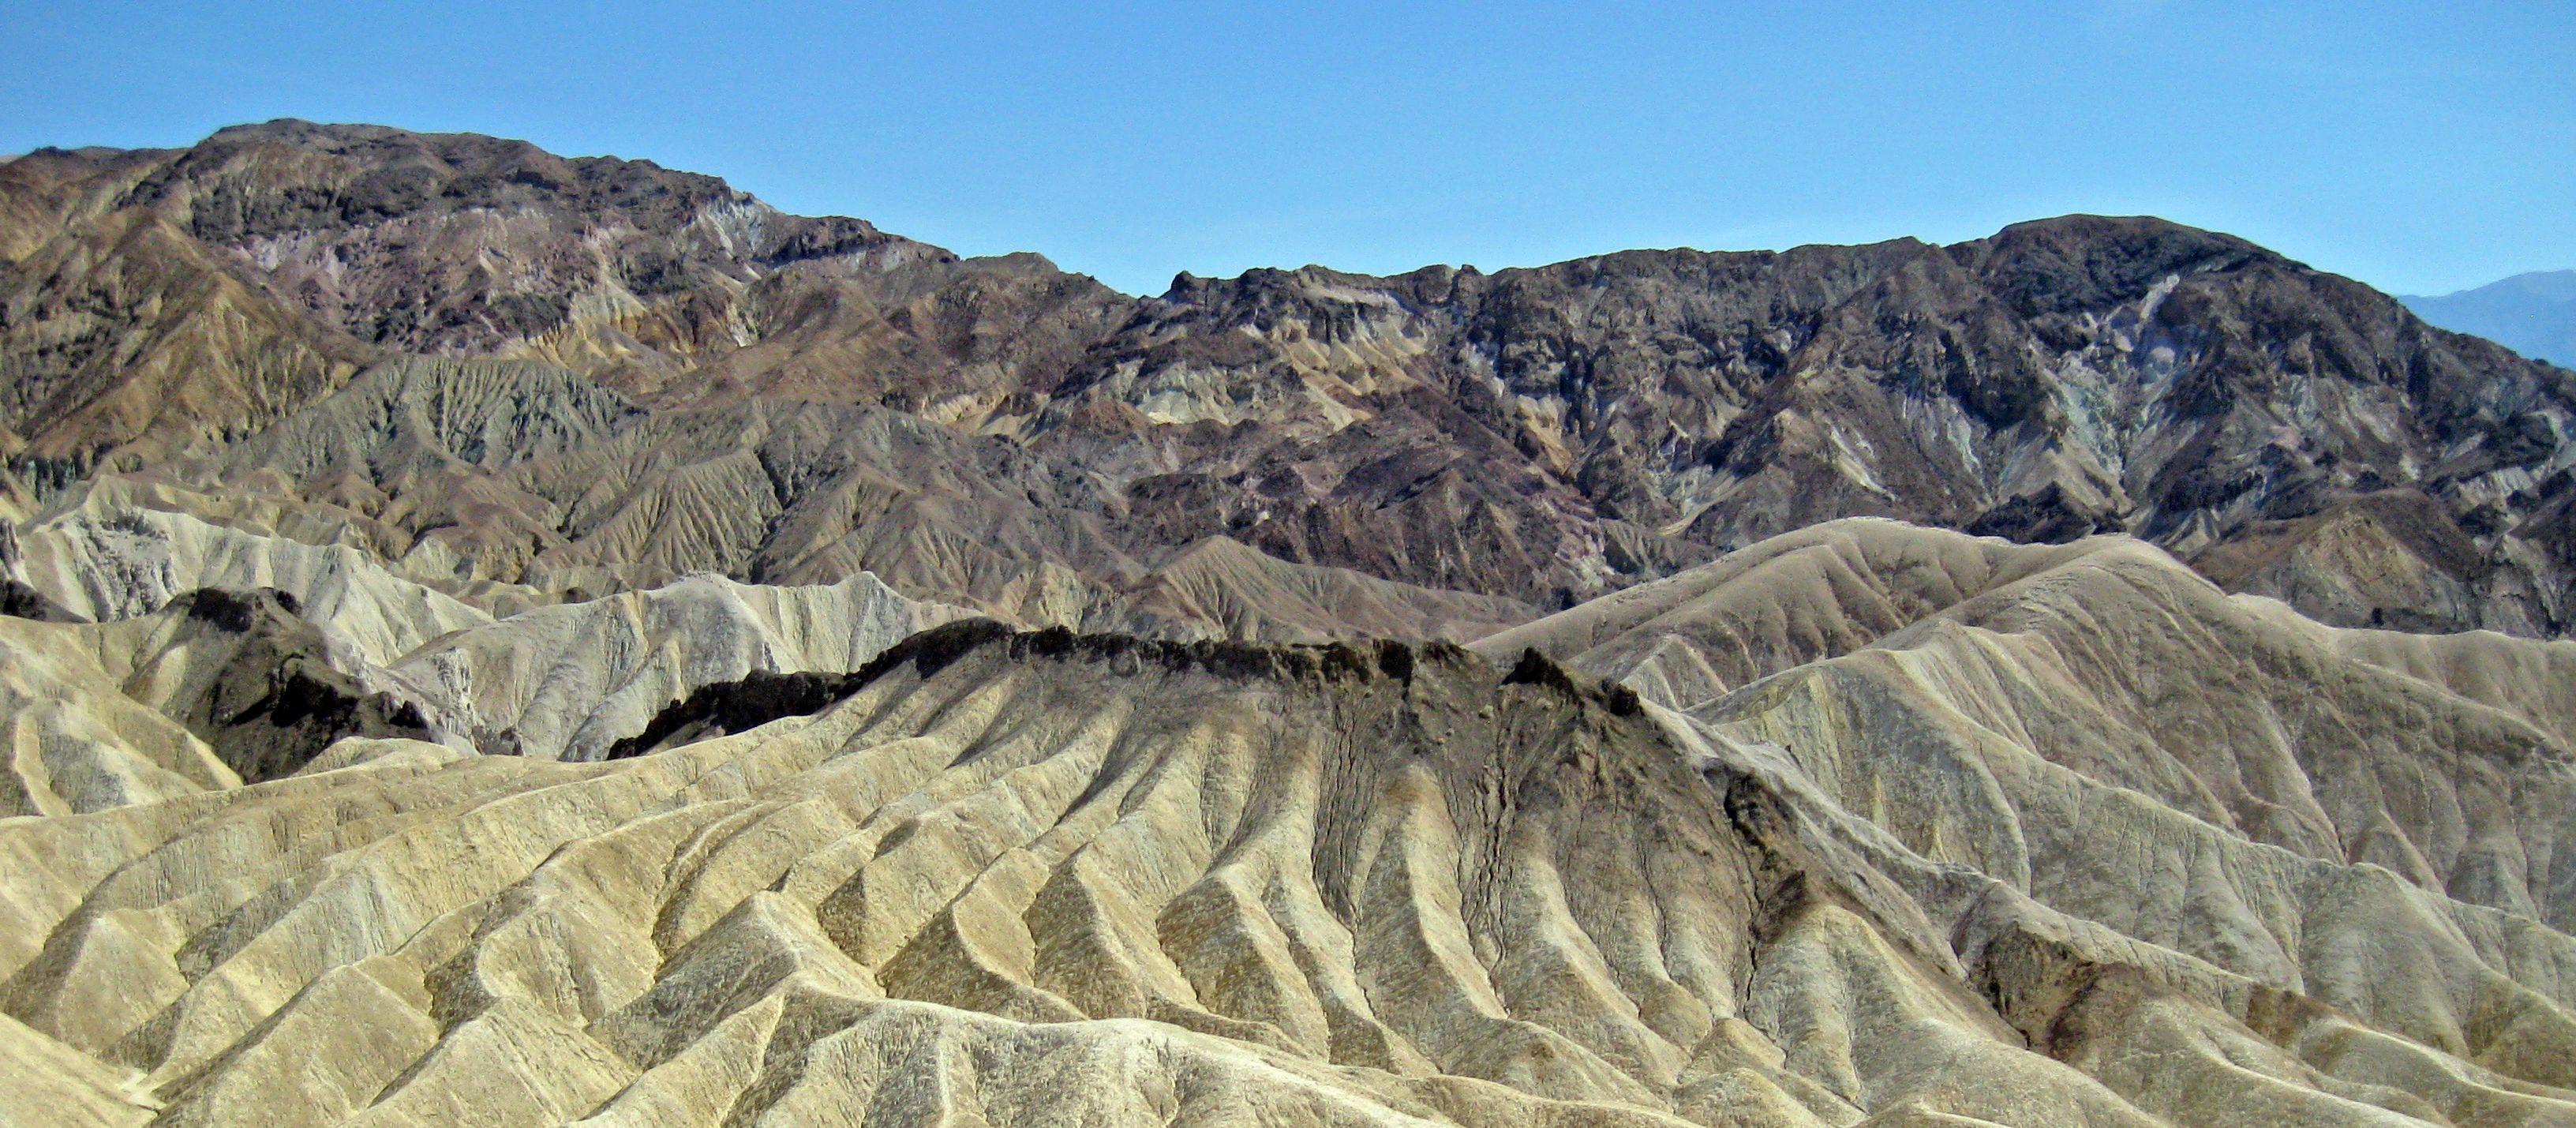 Felsformation im Death Valley